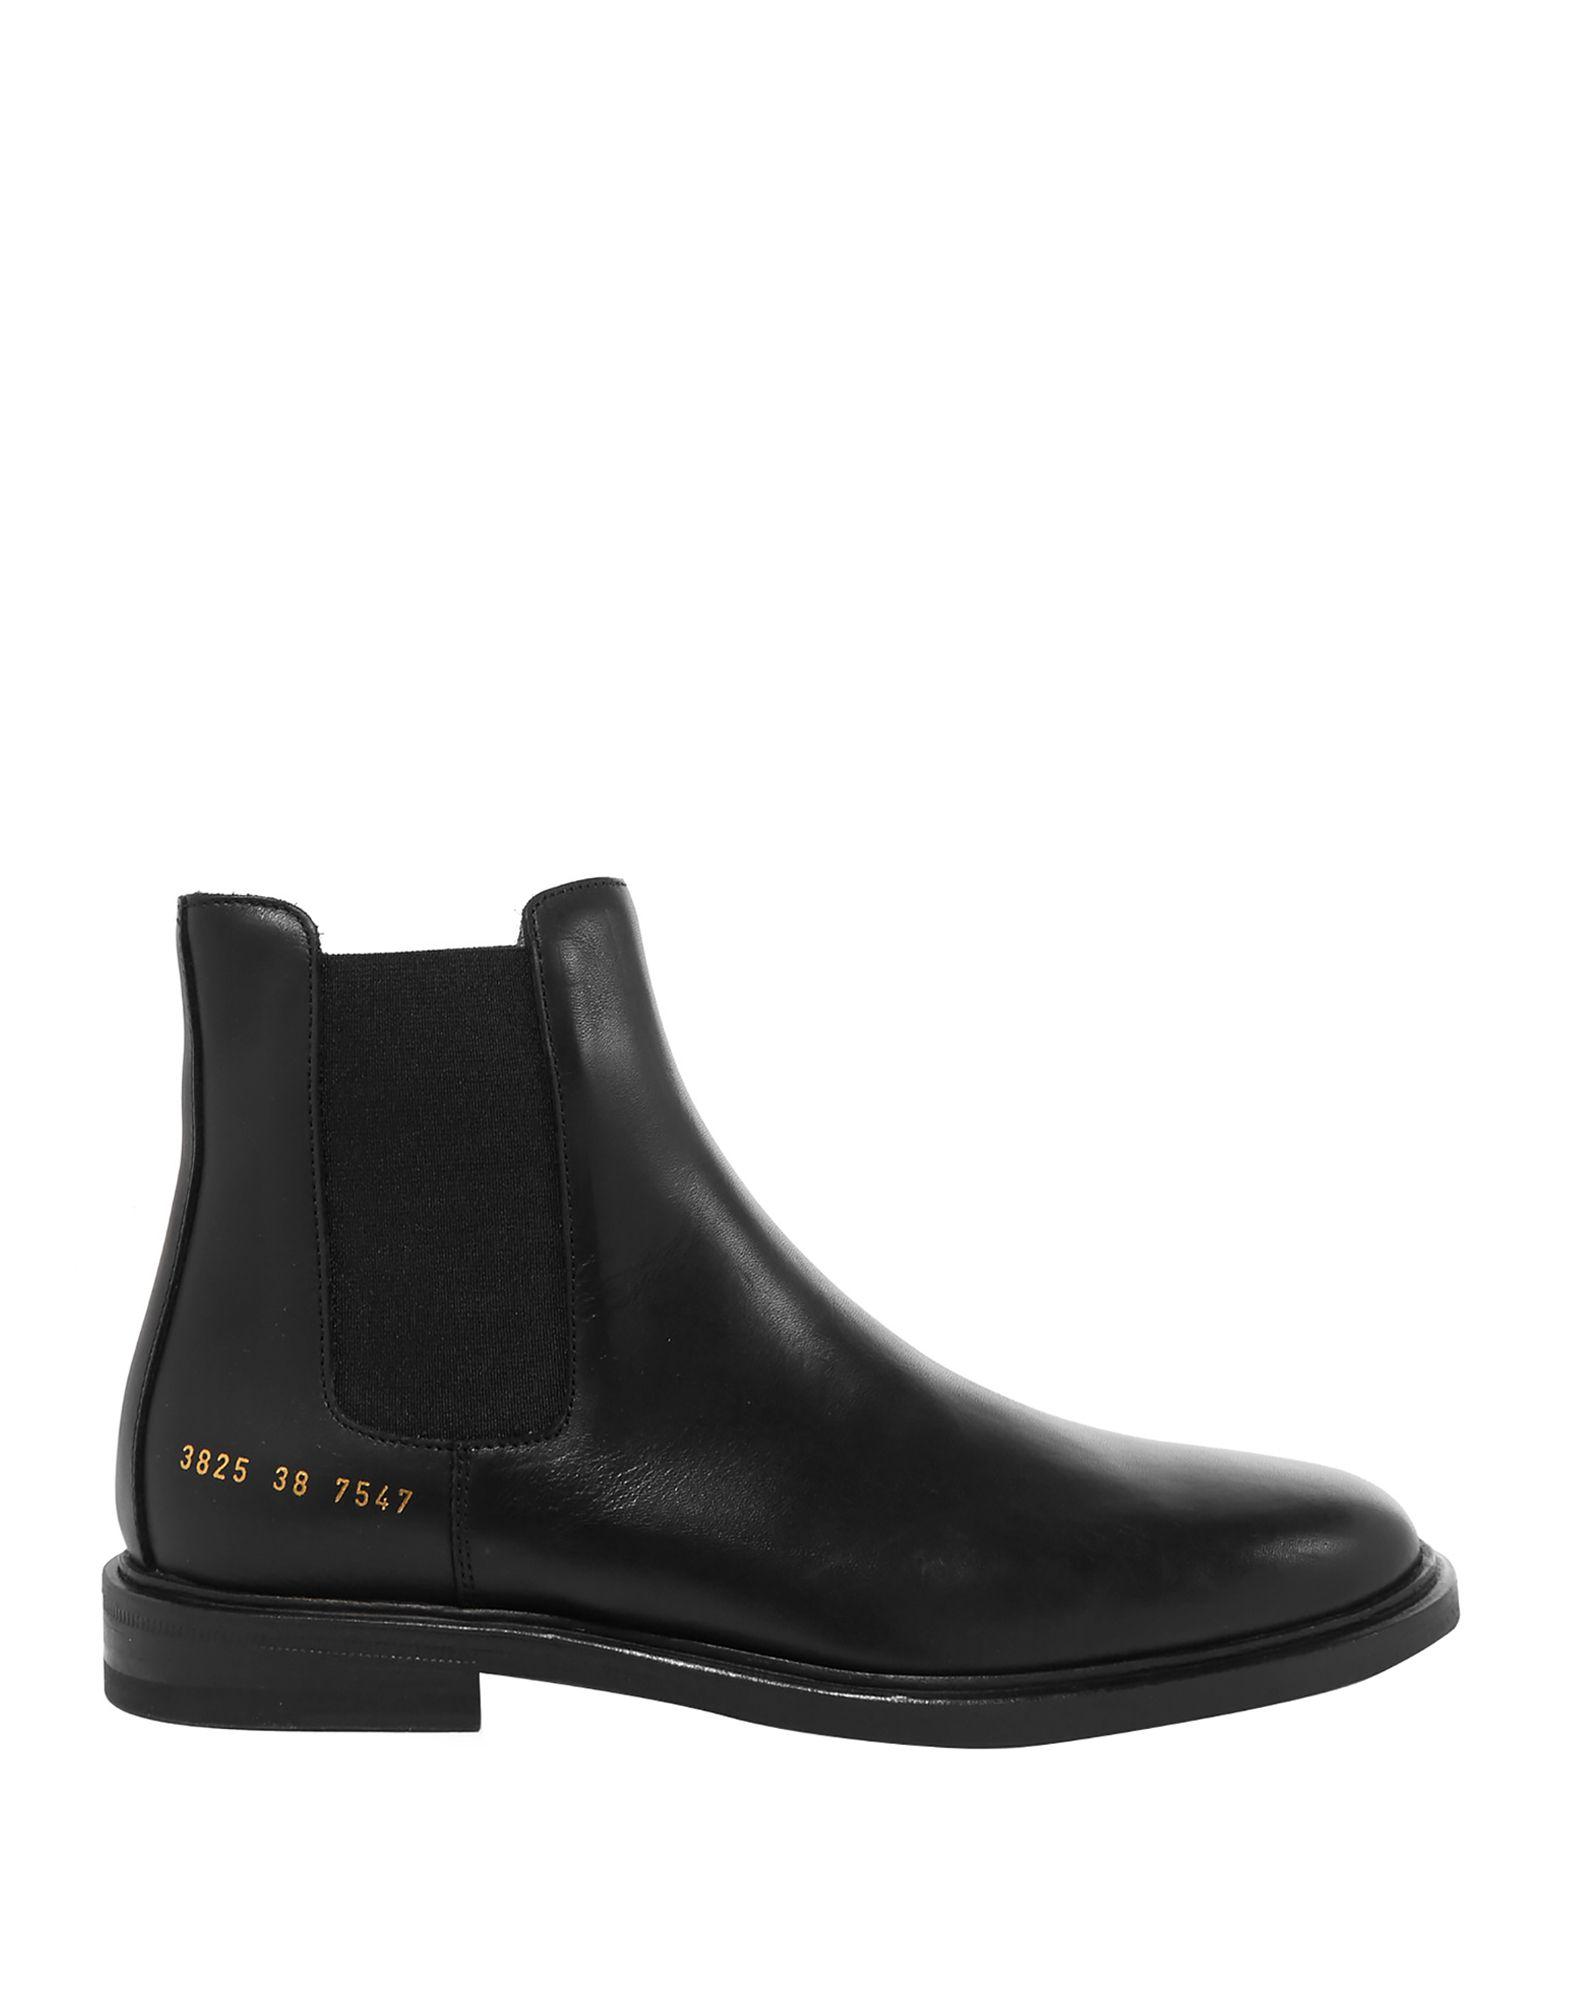 WOMAN by COMMON PROJECTS Полусапоги и высокие ботинки цены онлайн